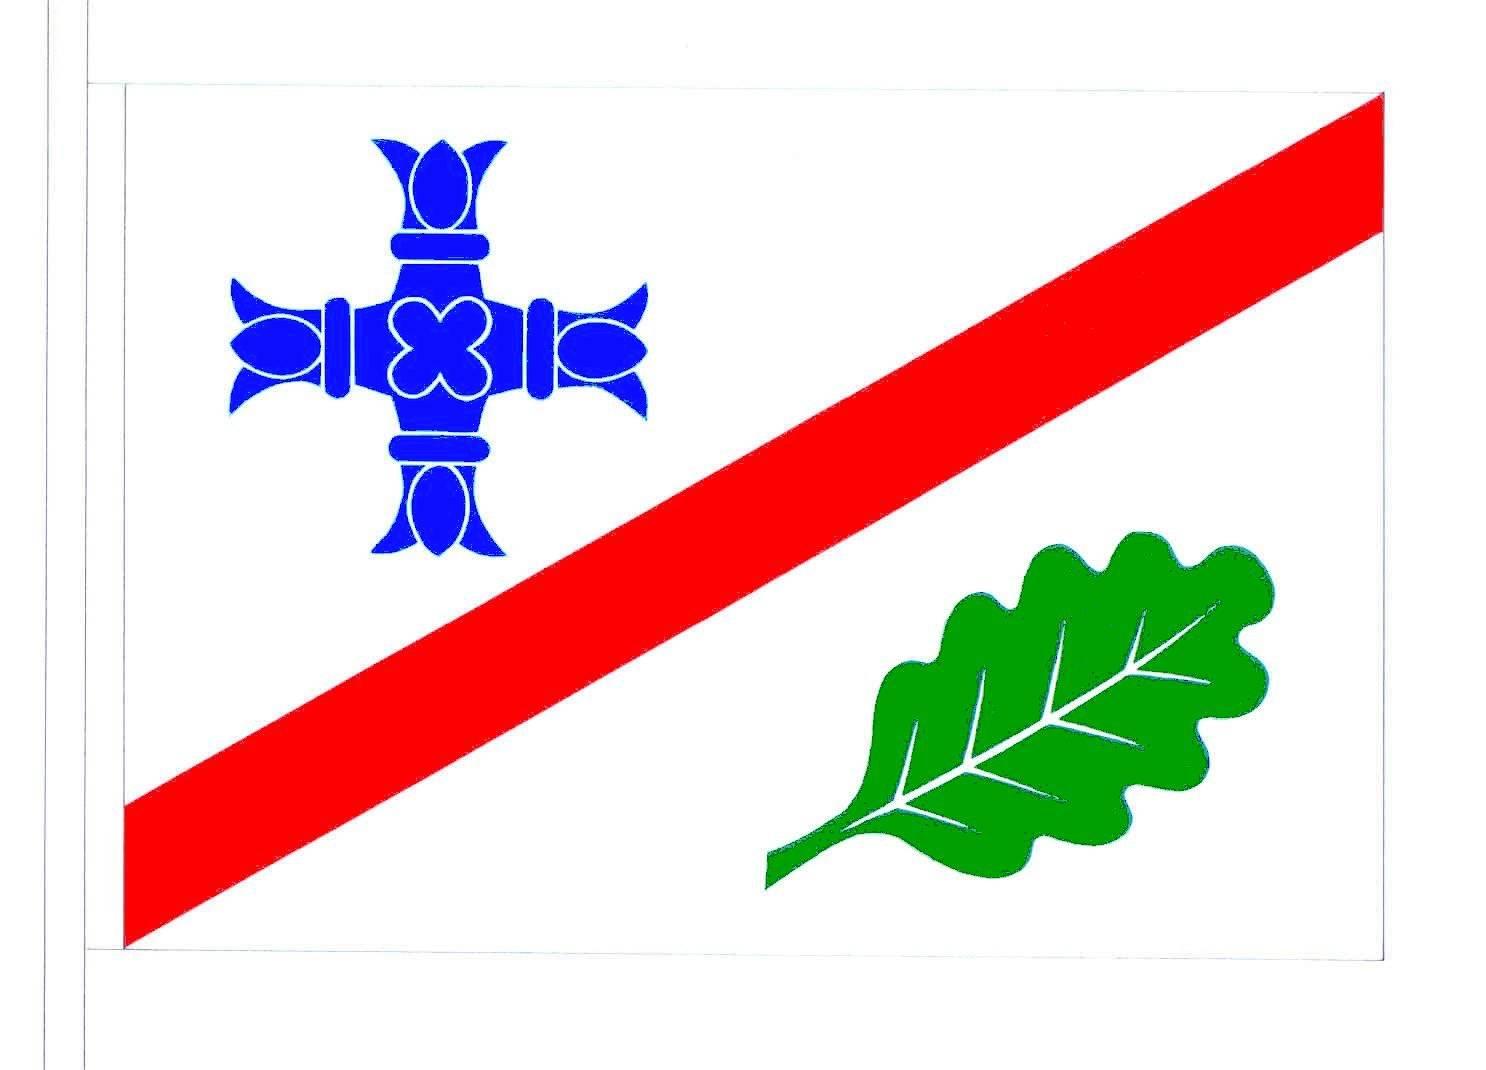 Flagge GemeindeBilsen, Kreis Pinneberg